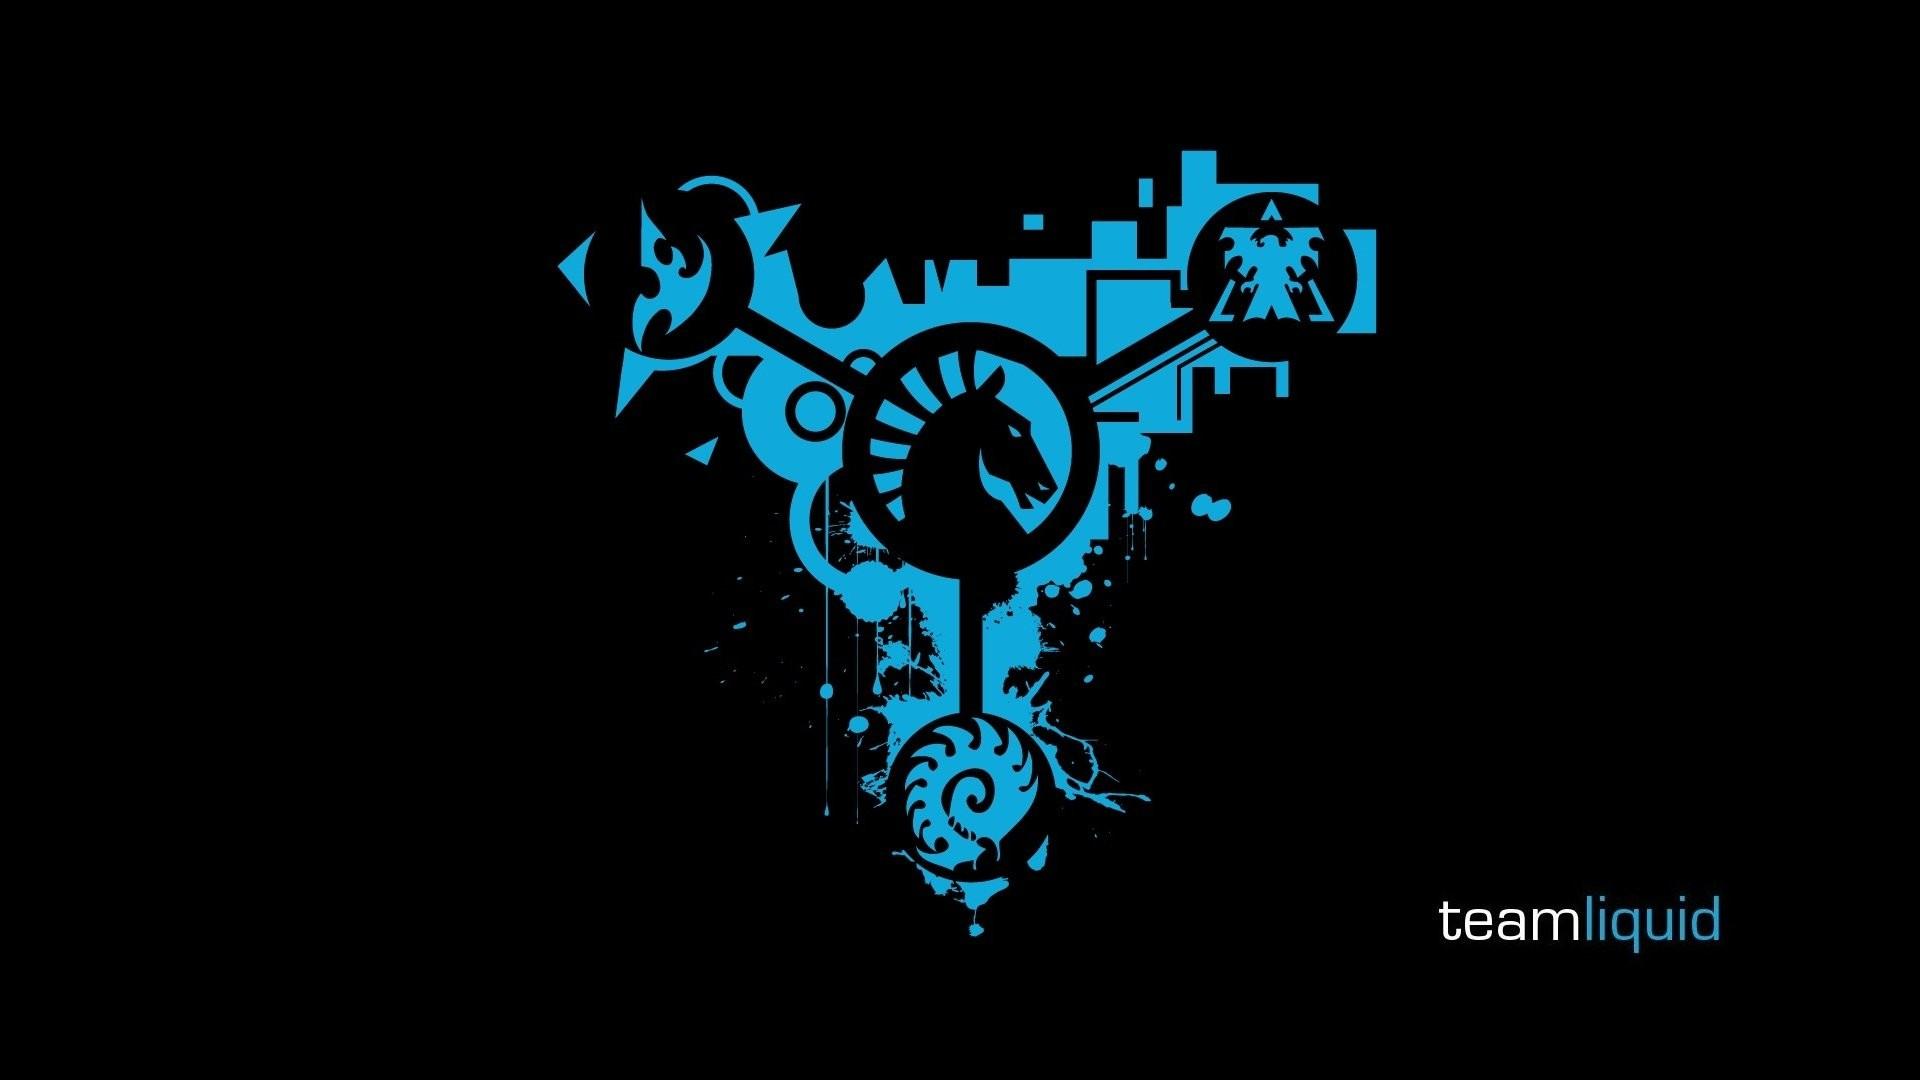 Logos Team Liquid StarCraft II black background wallpaper .